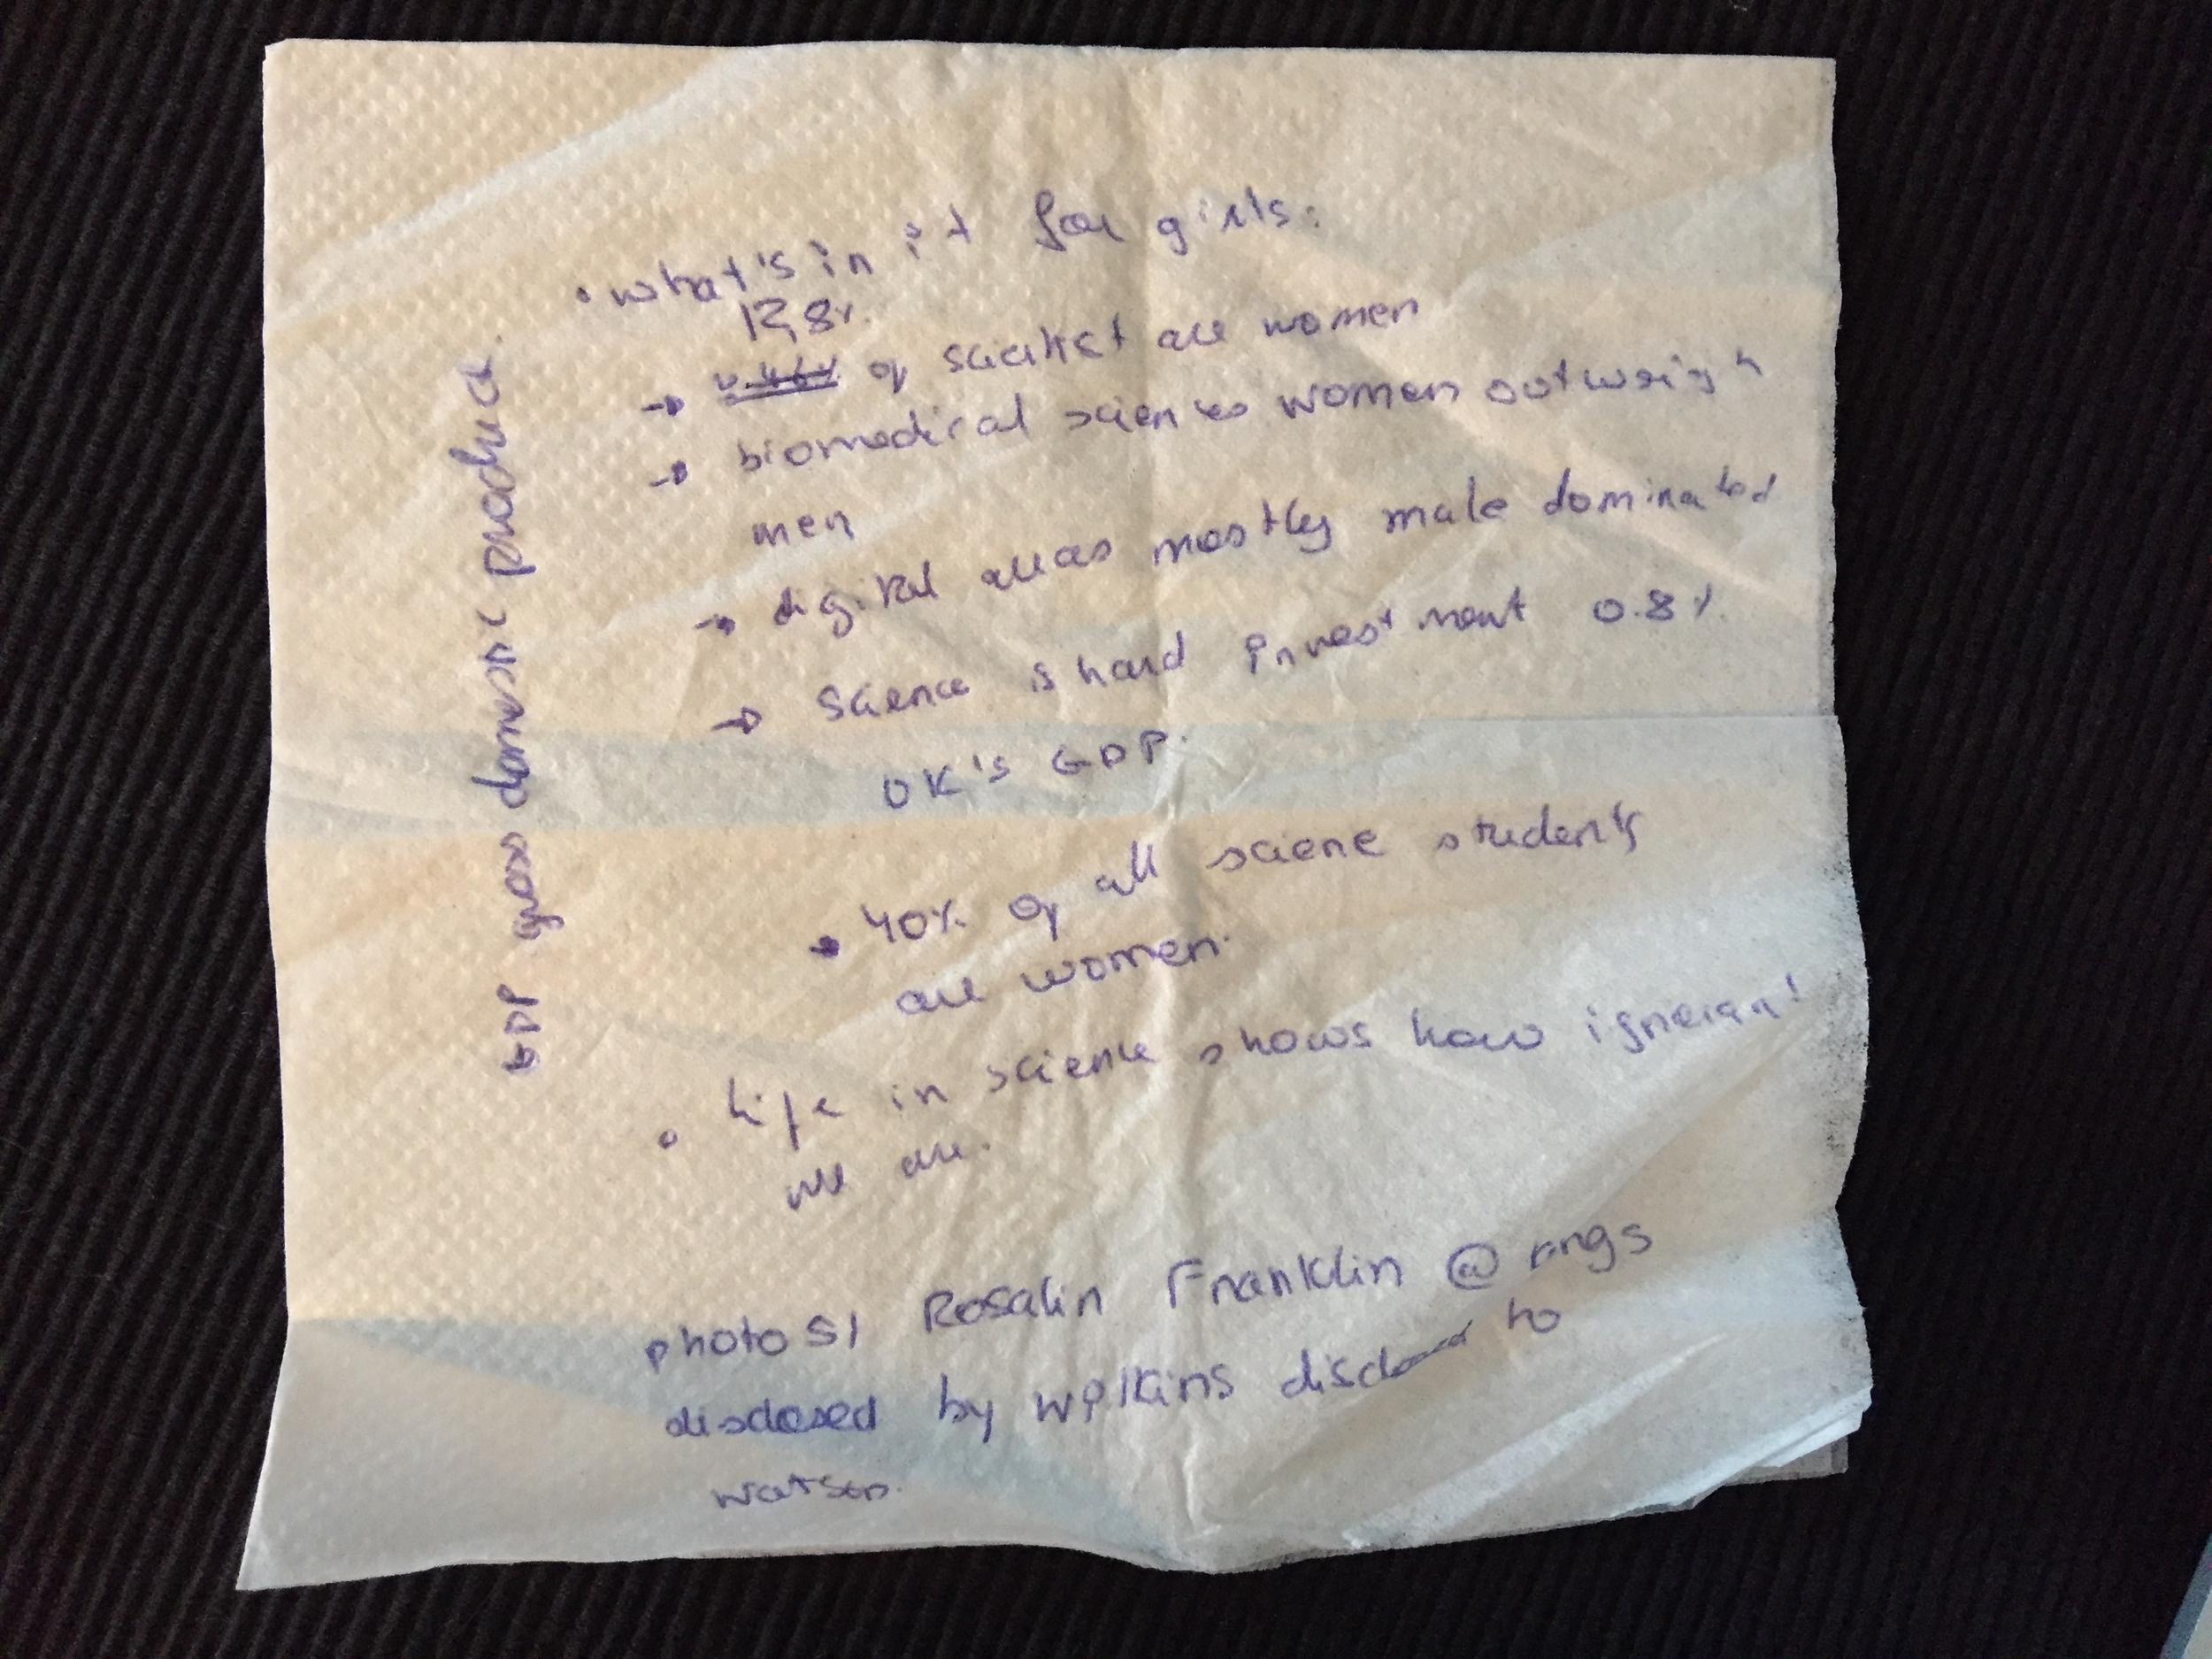 Renata's speech on a napkin